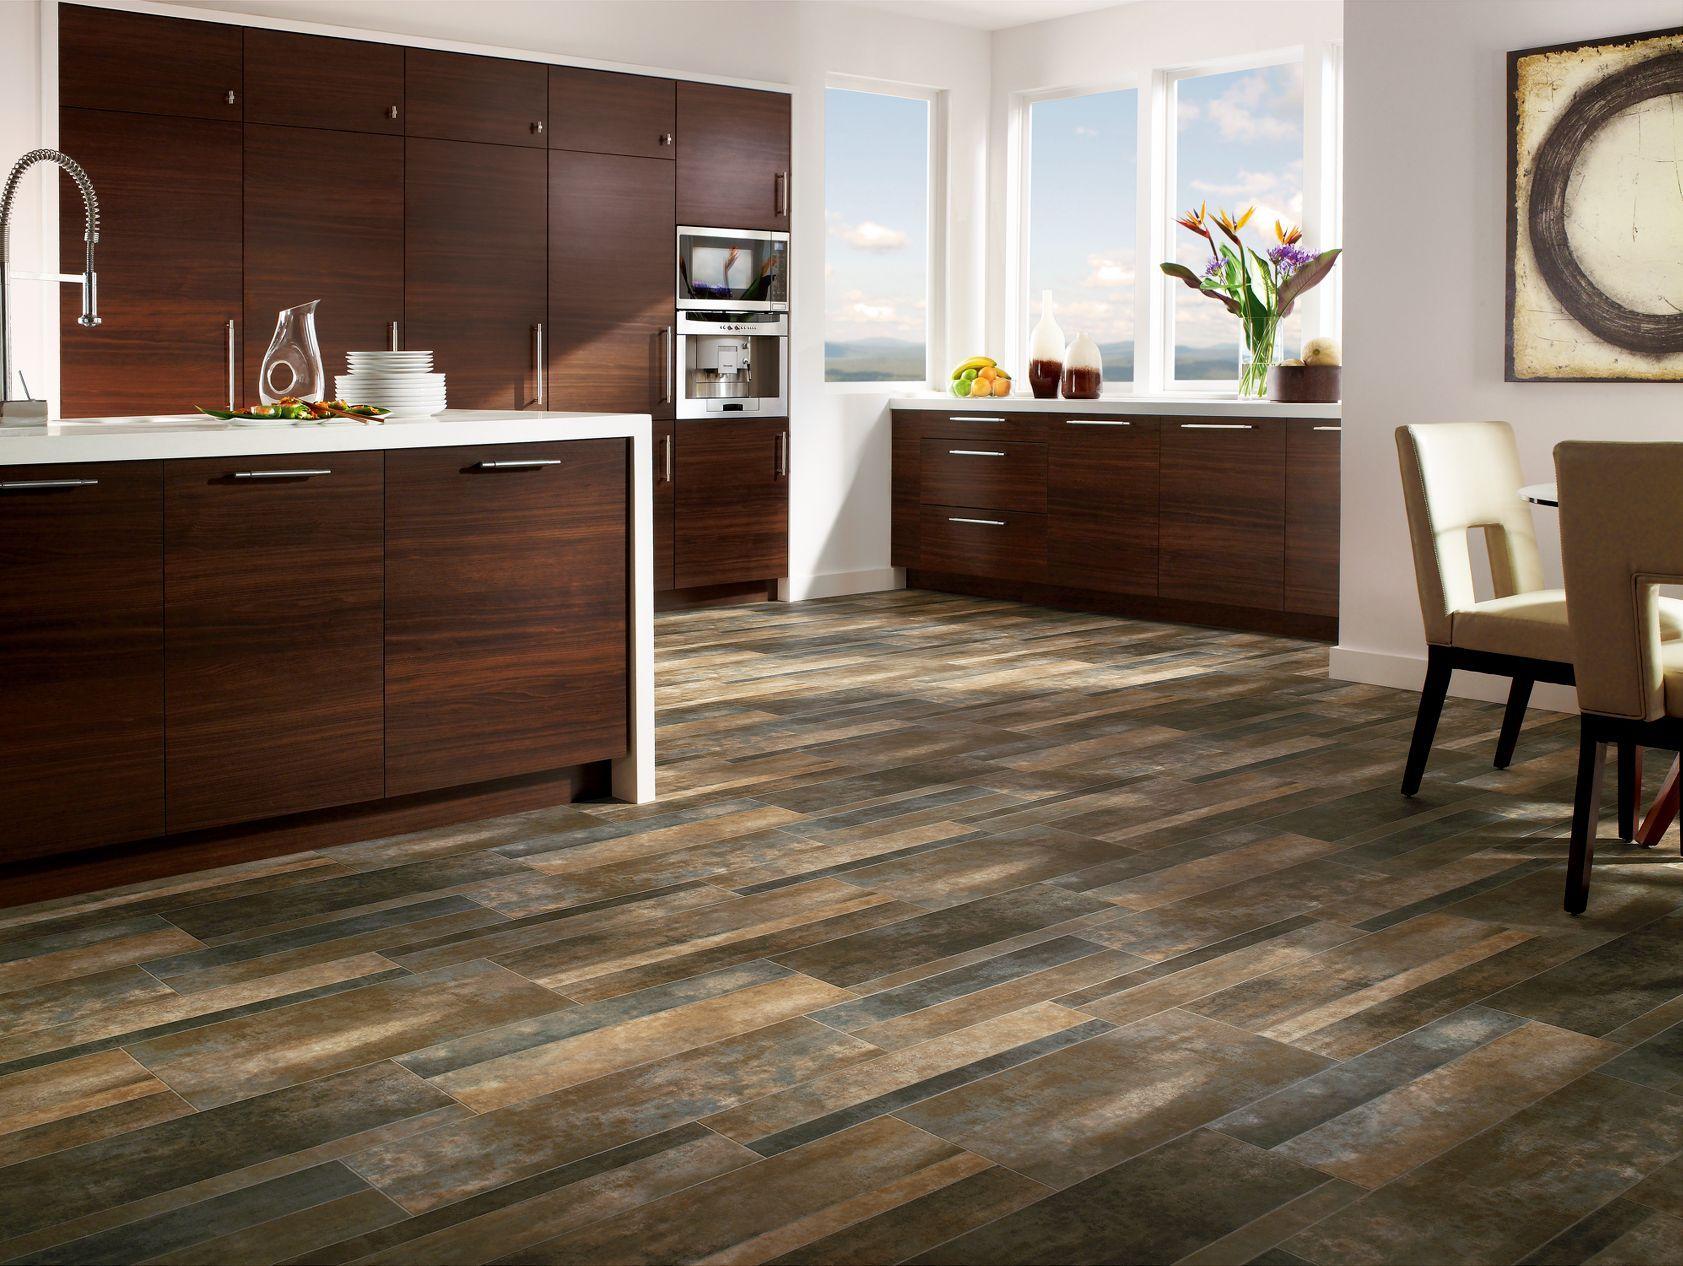 Appealing Vinyl Plank Flooring for Exciting Interior Floor